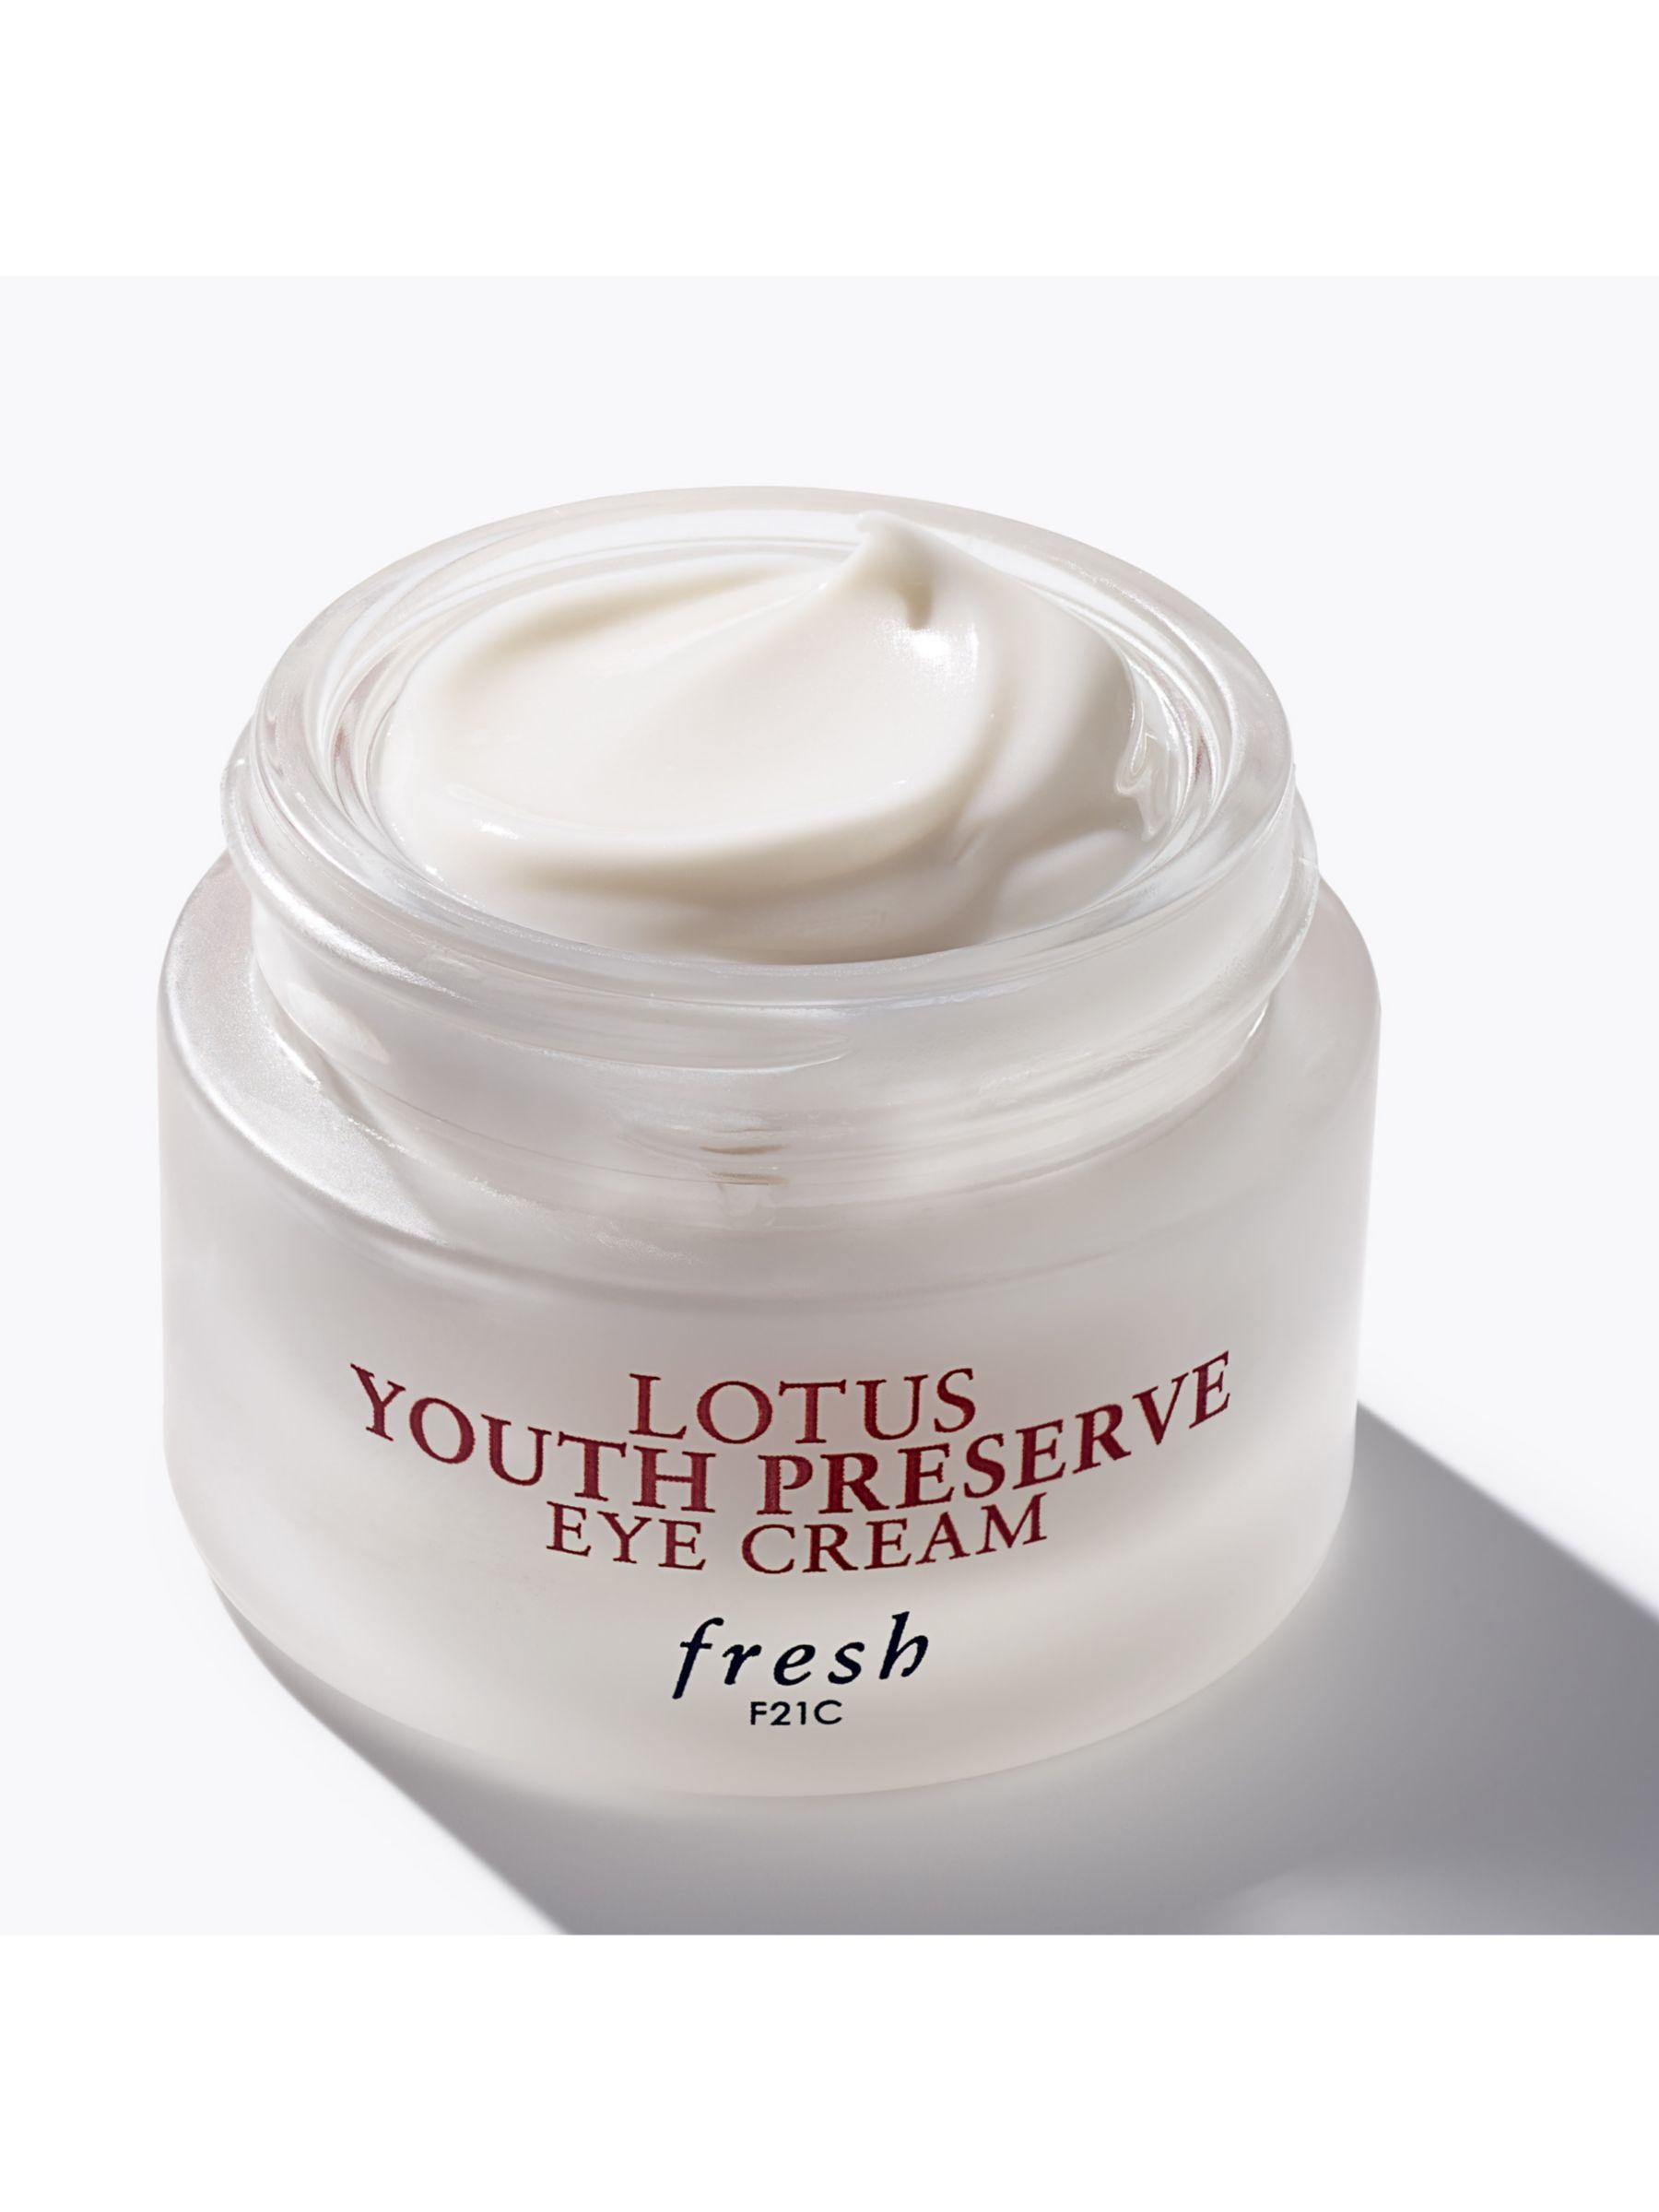 Lotus Youth Preserve Face Cream Price